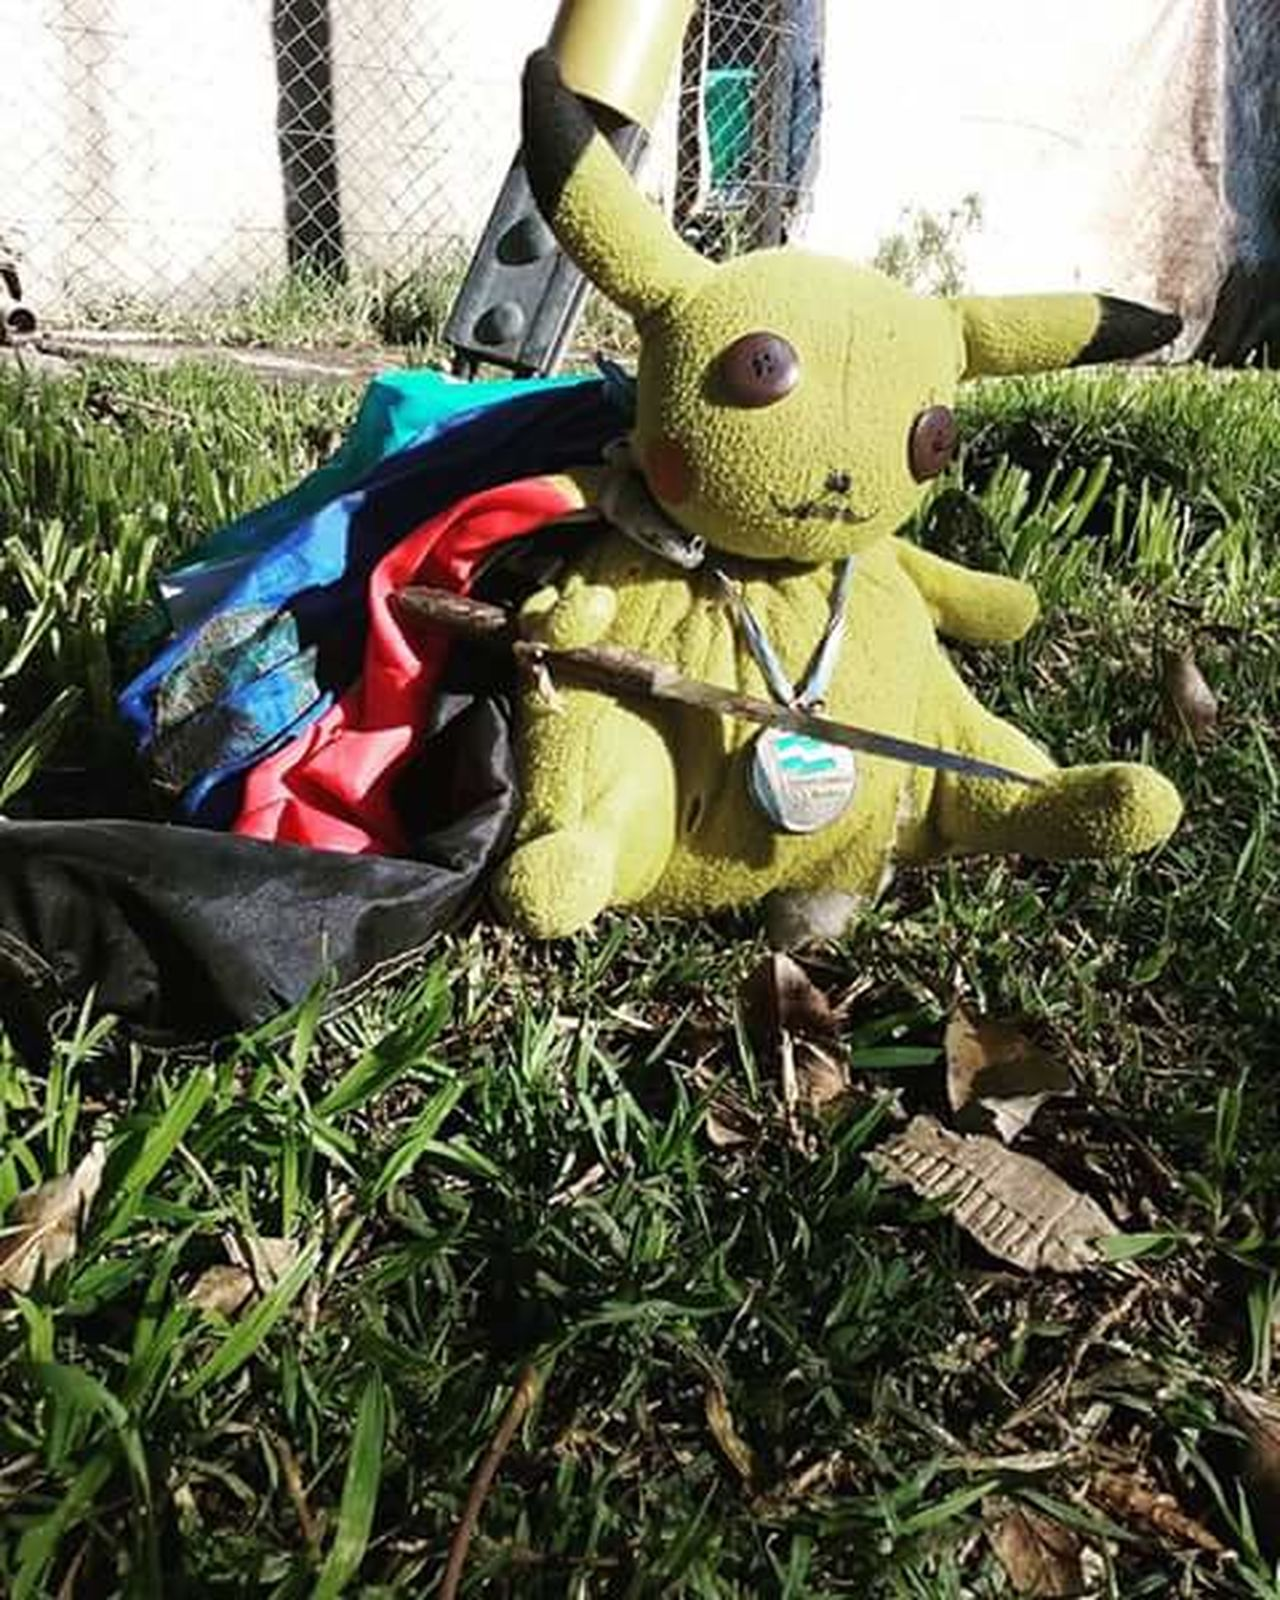 Day Outdoors No People Grass Close-up Pikachu Pokémon Pokemon Go Cuchillo Ladron